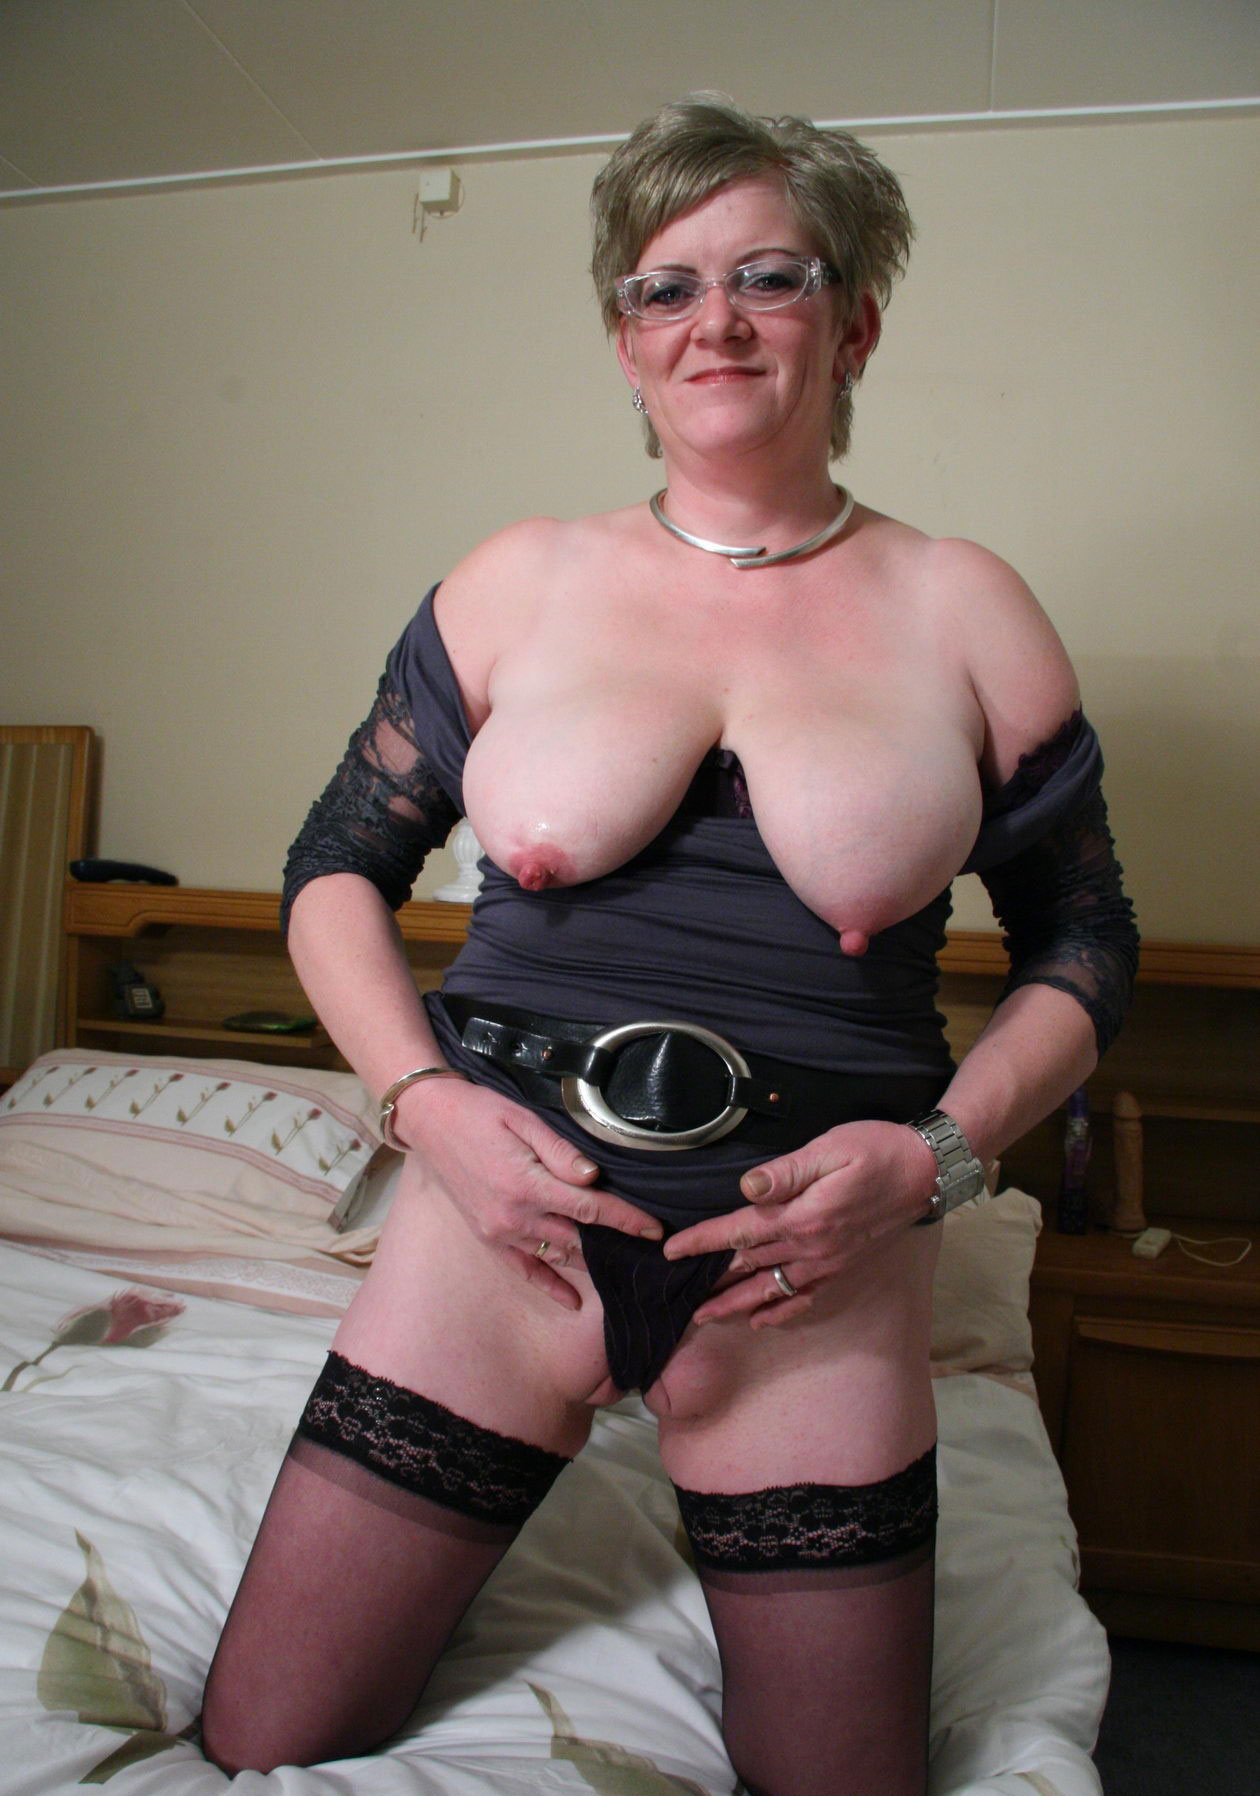 genuine woman, Big breasted hispanic women can talkative and